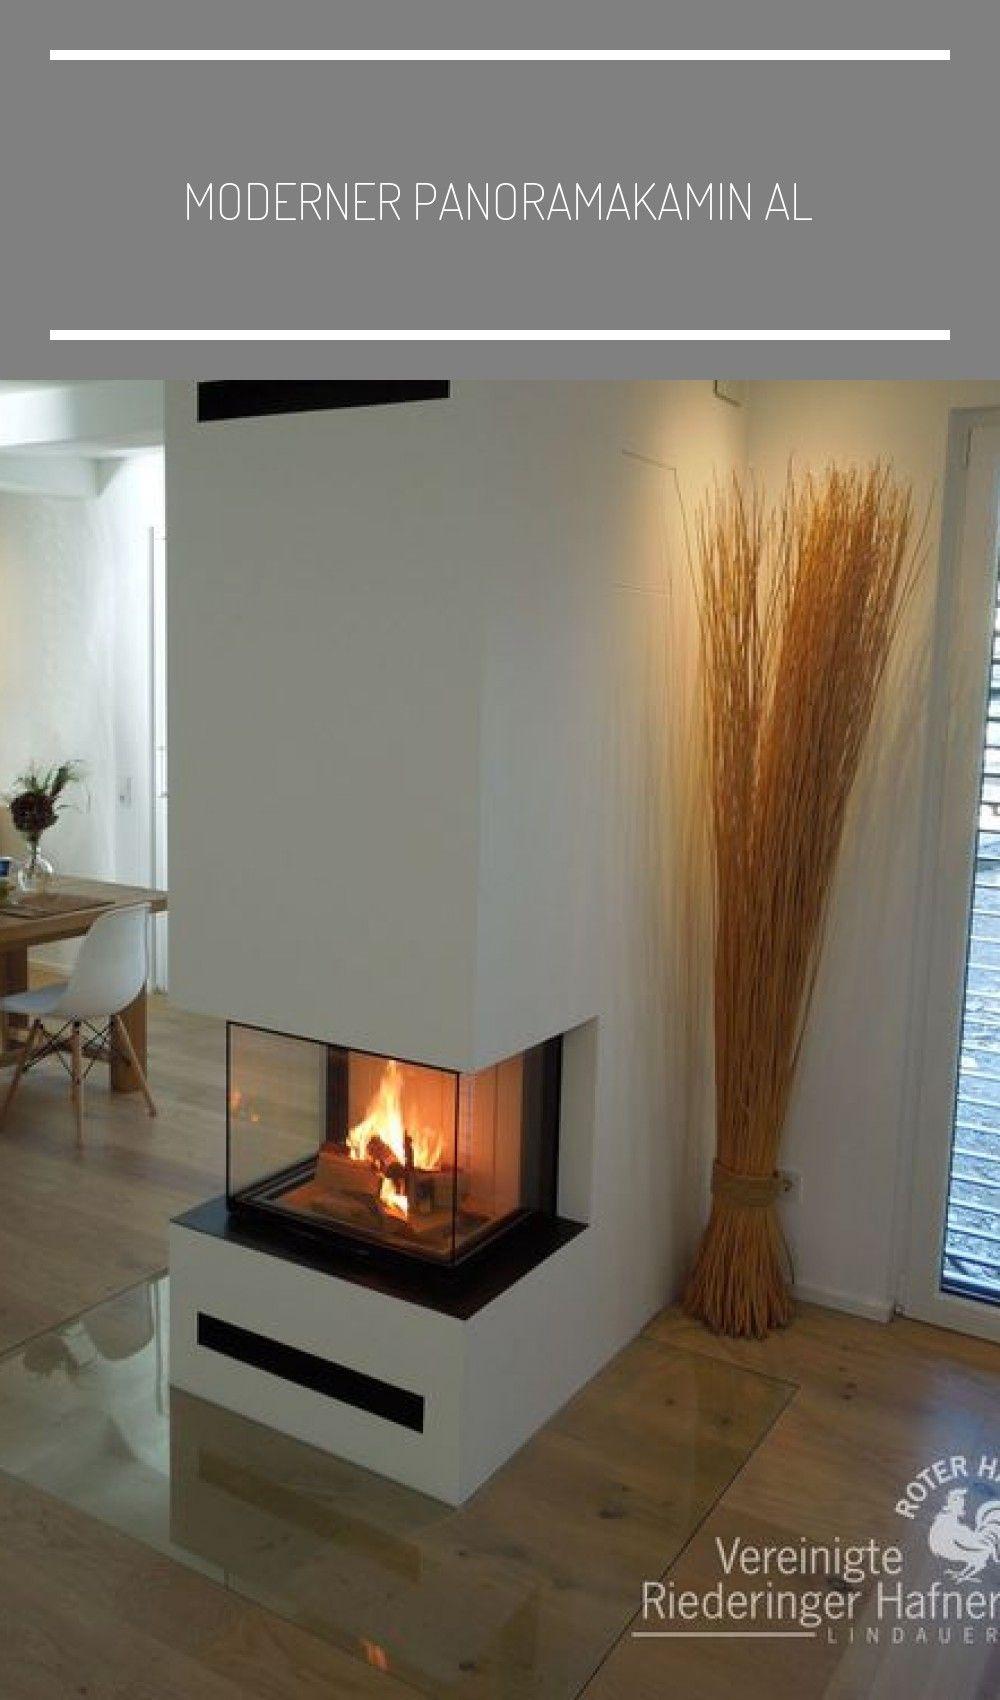 Moderner Panoramakamin Als Raumteiler Panoramakamin Kamin Ofen Fireplace Moderner Ofen Ofenbauer Ofenkunst Riederinger Home Modern Fireplace Home Decor